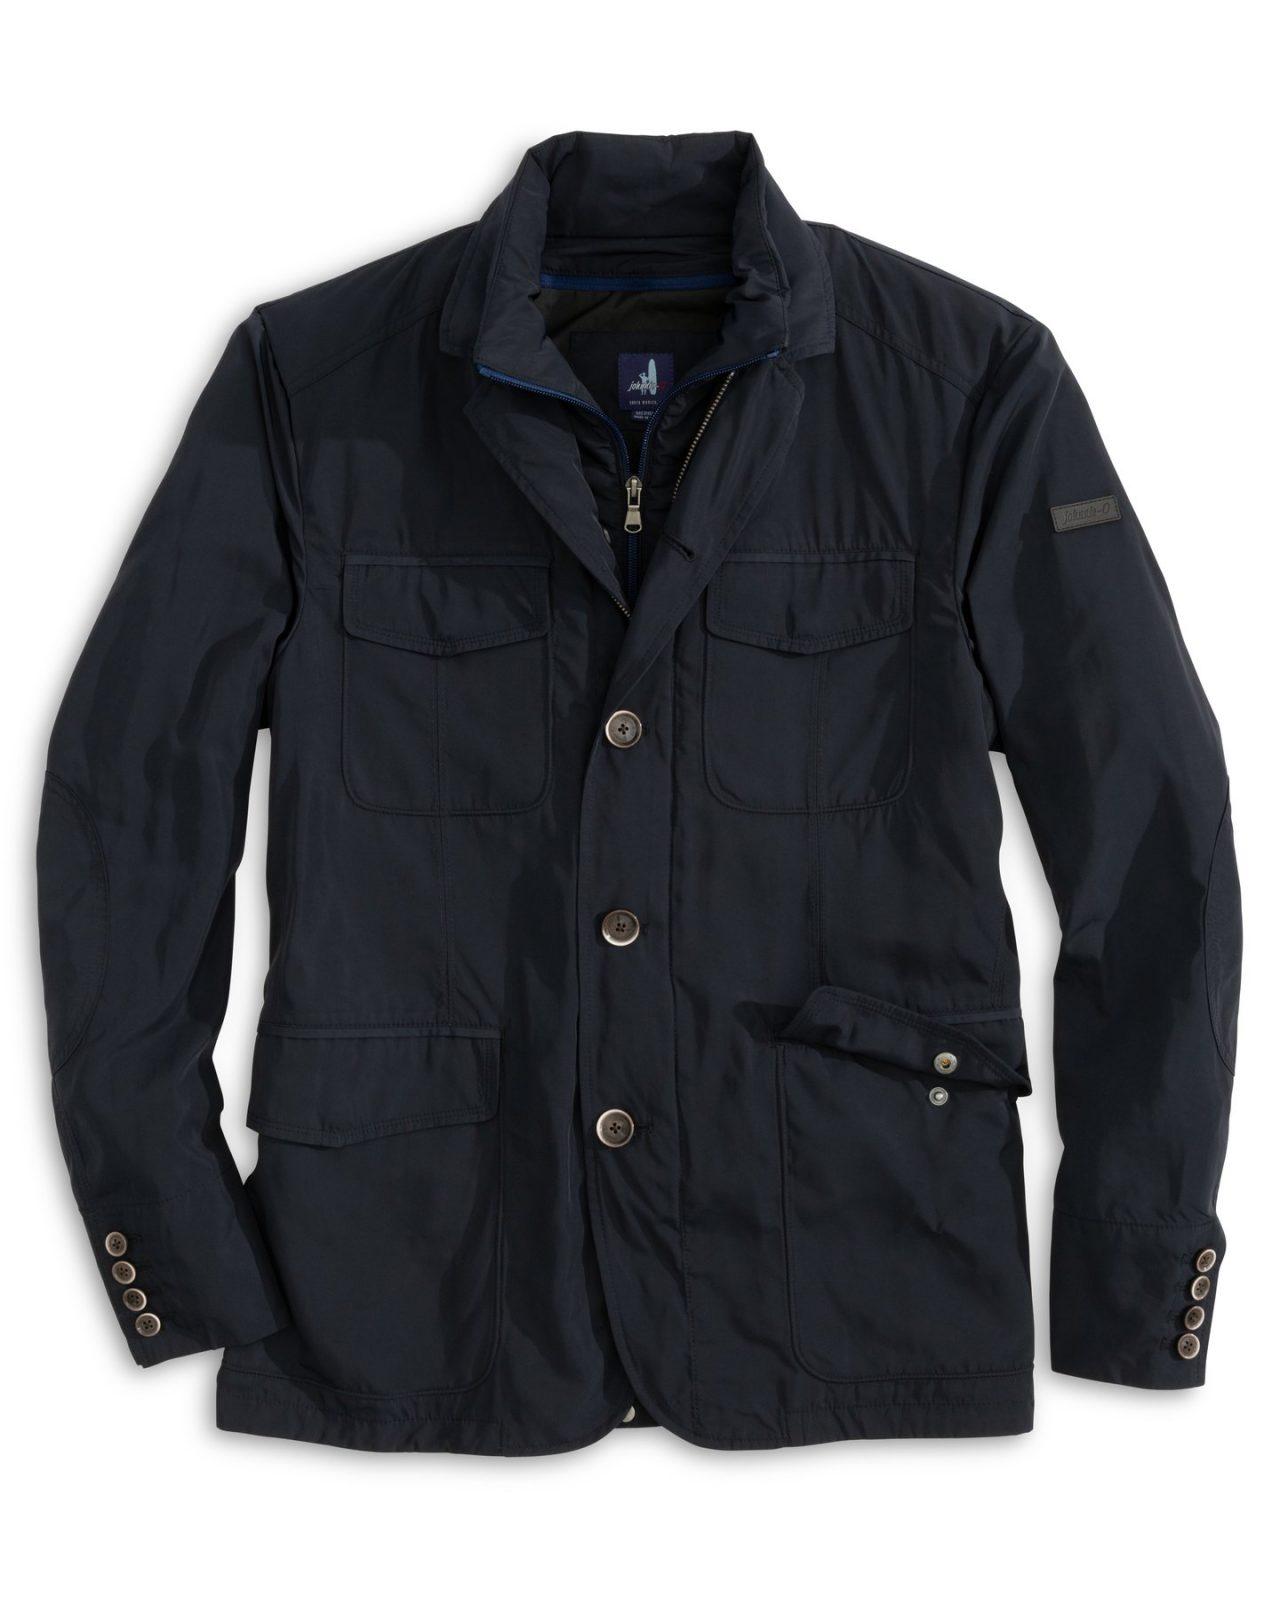 Johnnie-O Phelps Lightweight Field Jacket